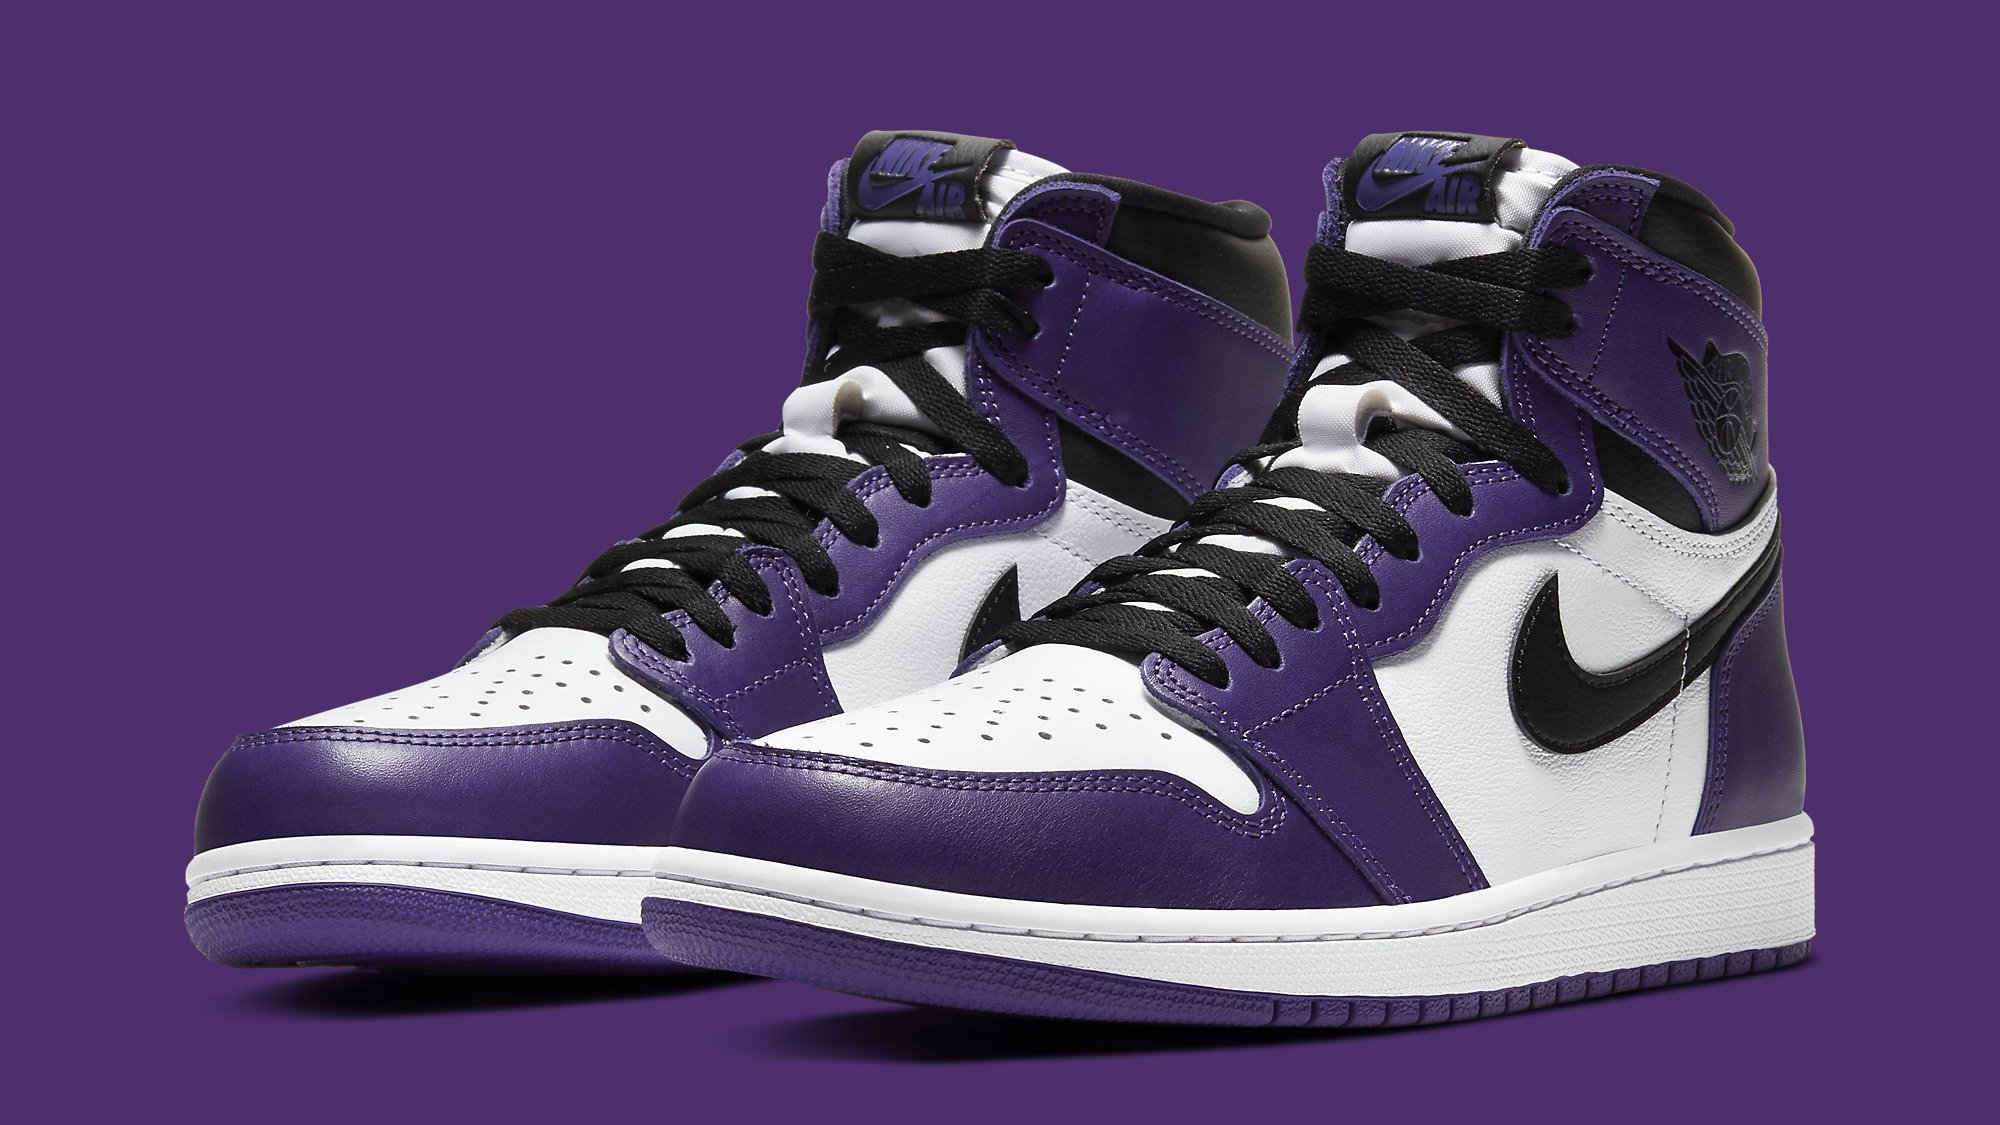 jordan 1 purple white